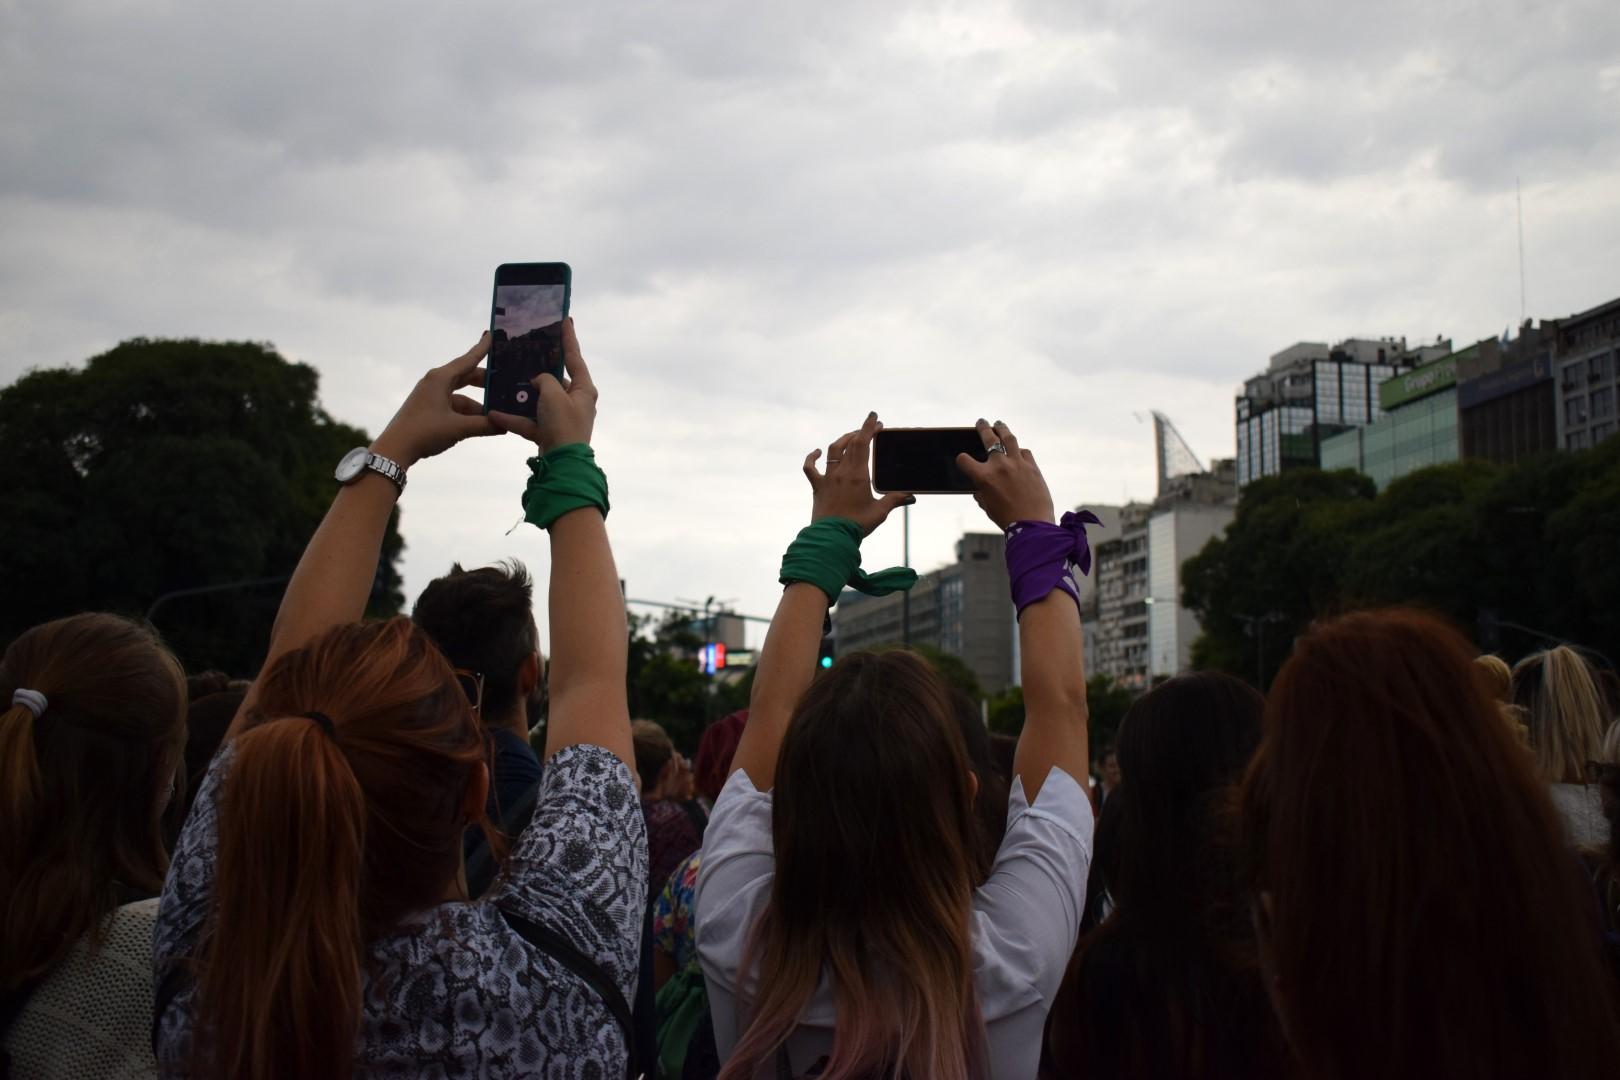 Women's March on Monday, March 9, Avenida 9 de Julio, Buenos Aires